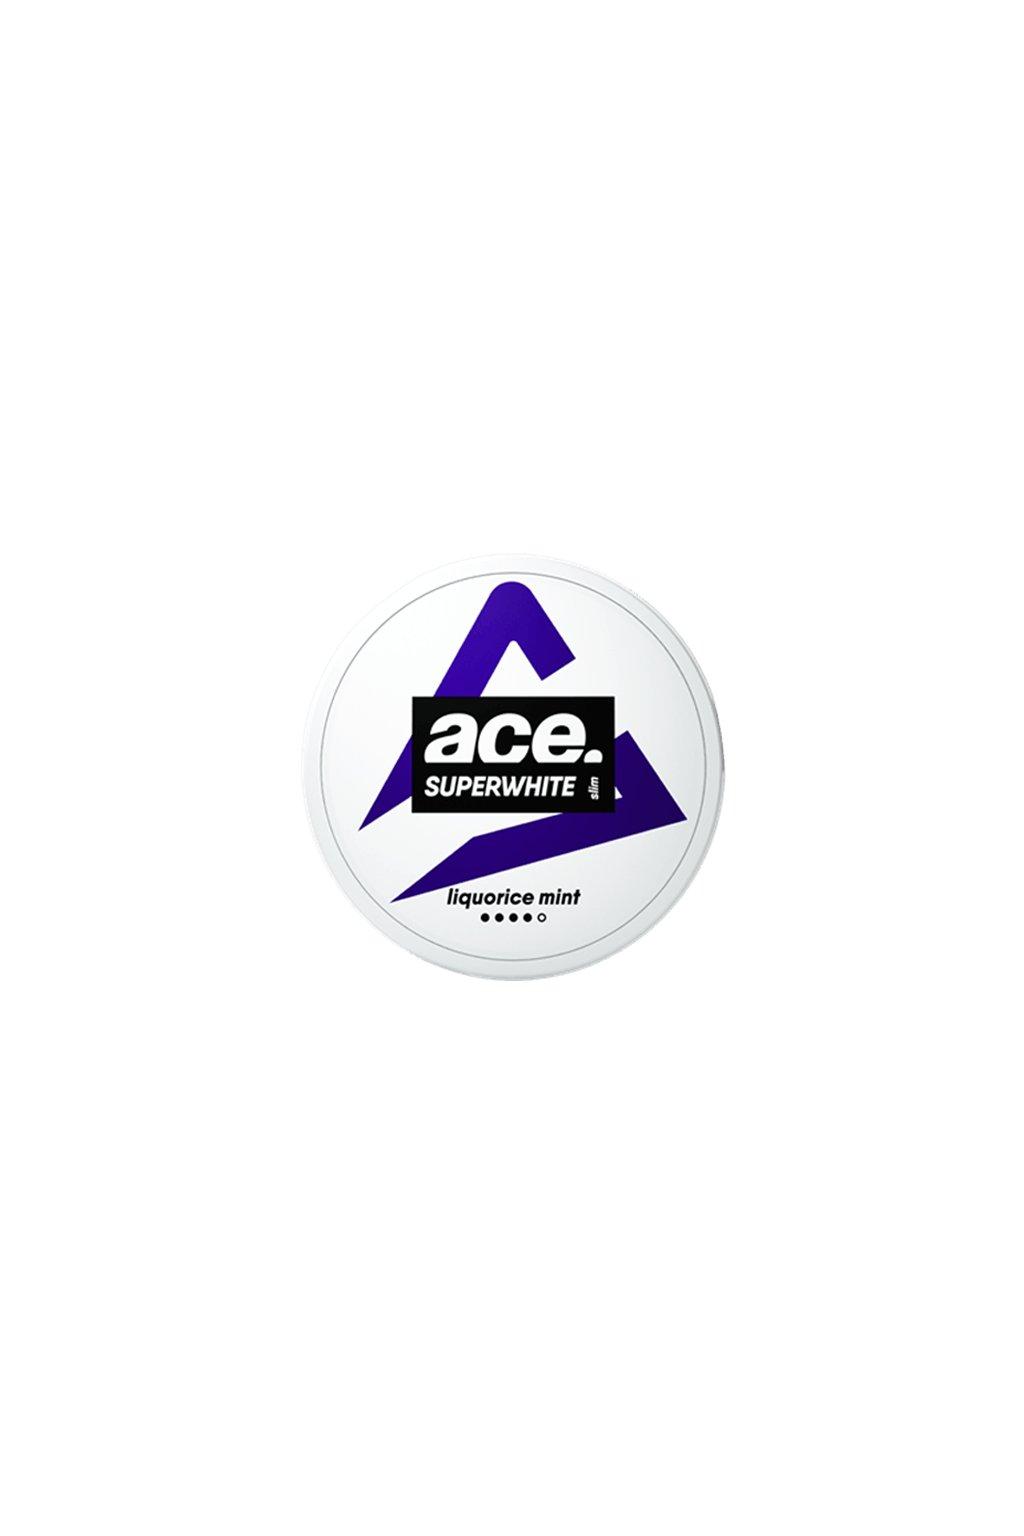 ace superwhite liquorice slim strong nikotinove sacky nicopods nordiction